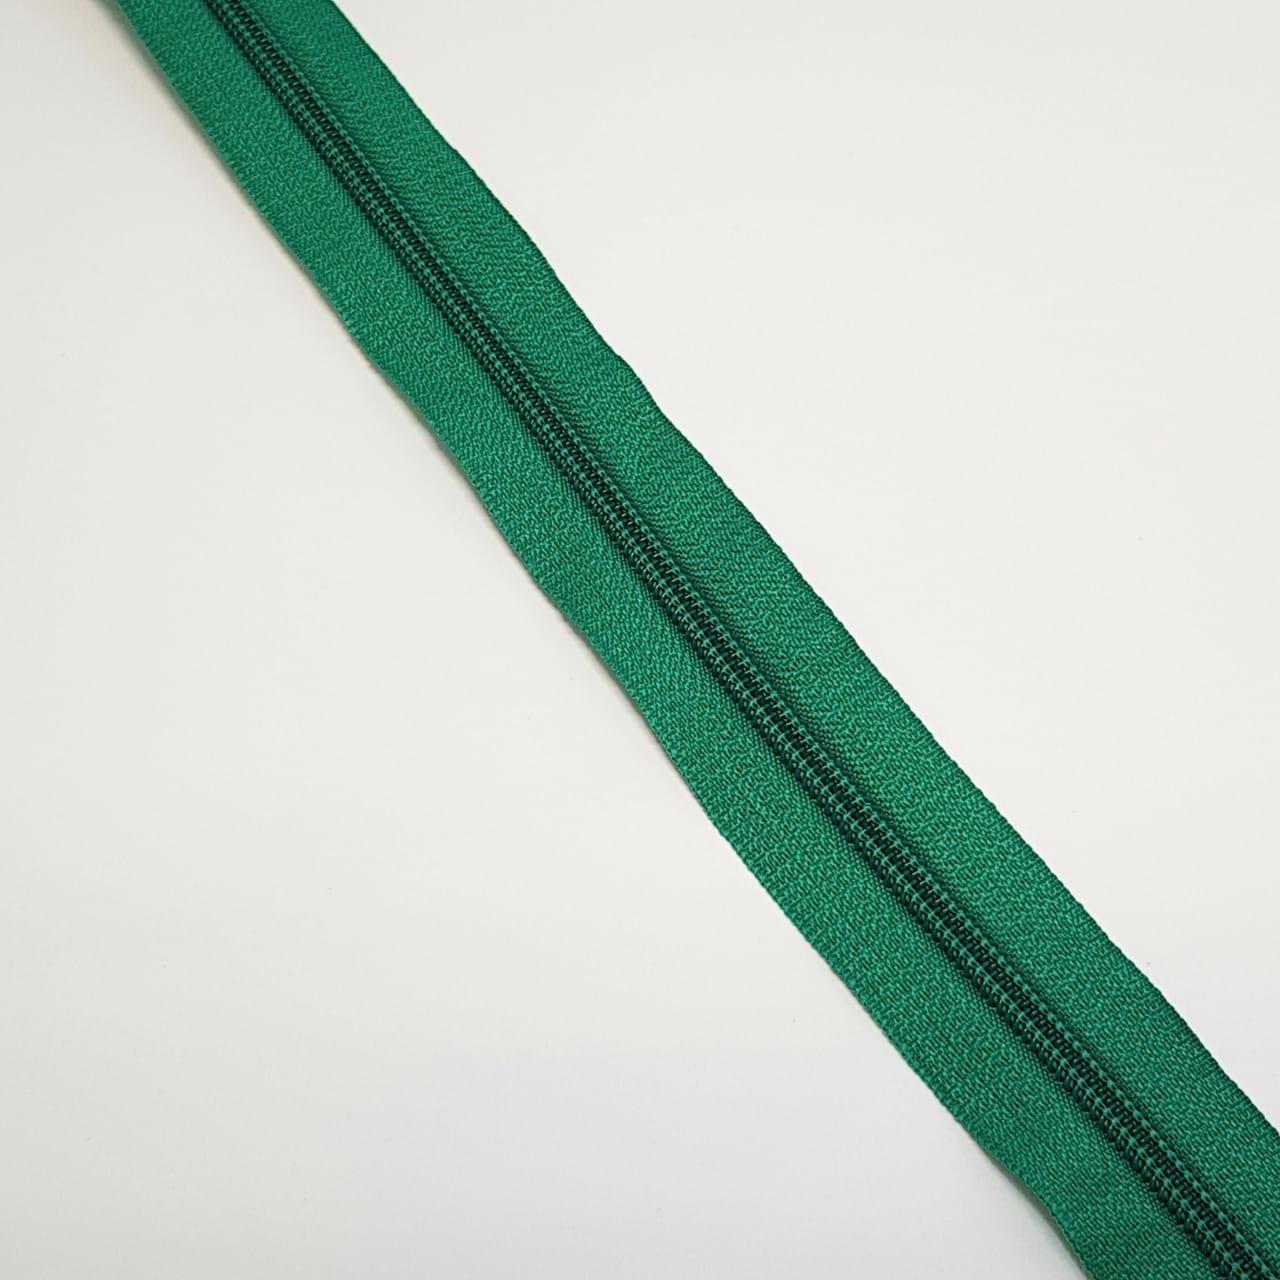 Zíper ZR - 5mm - verde bandeira